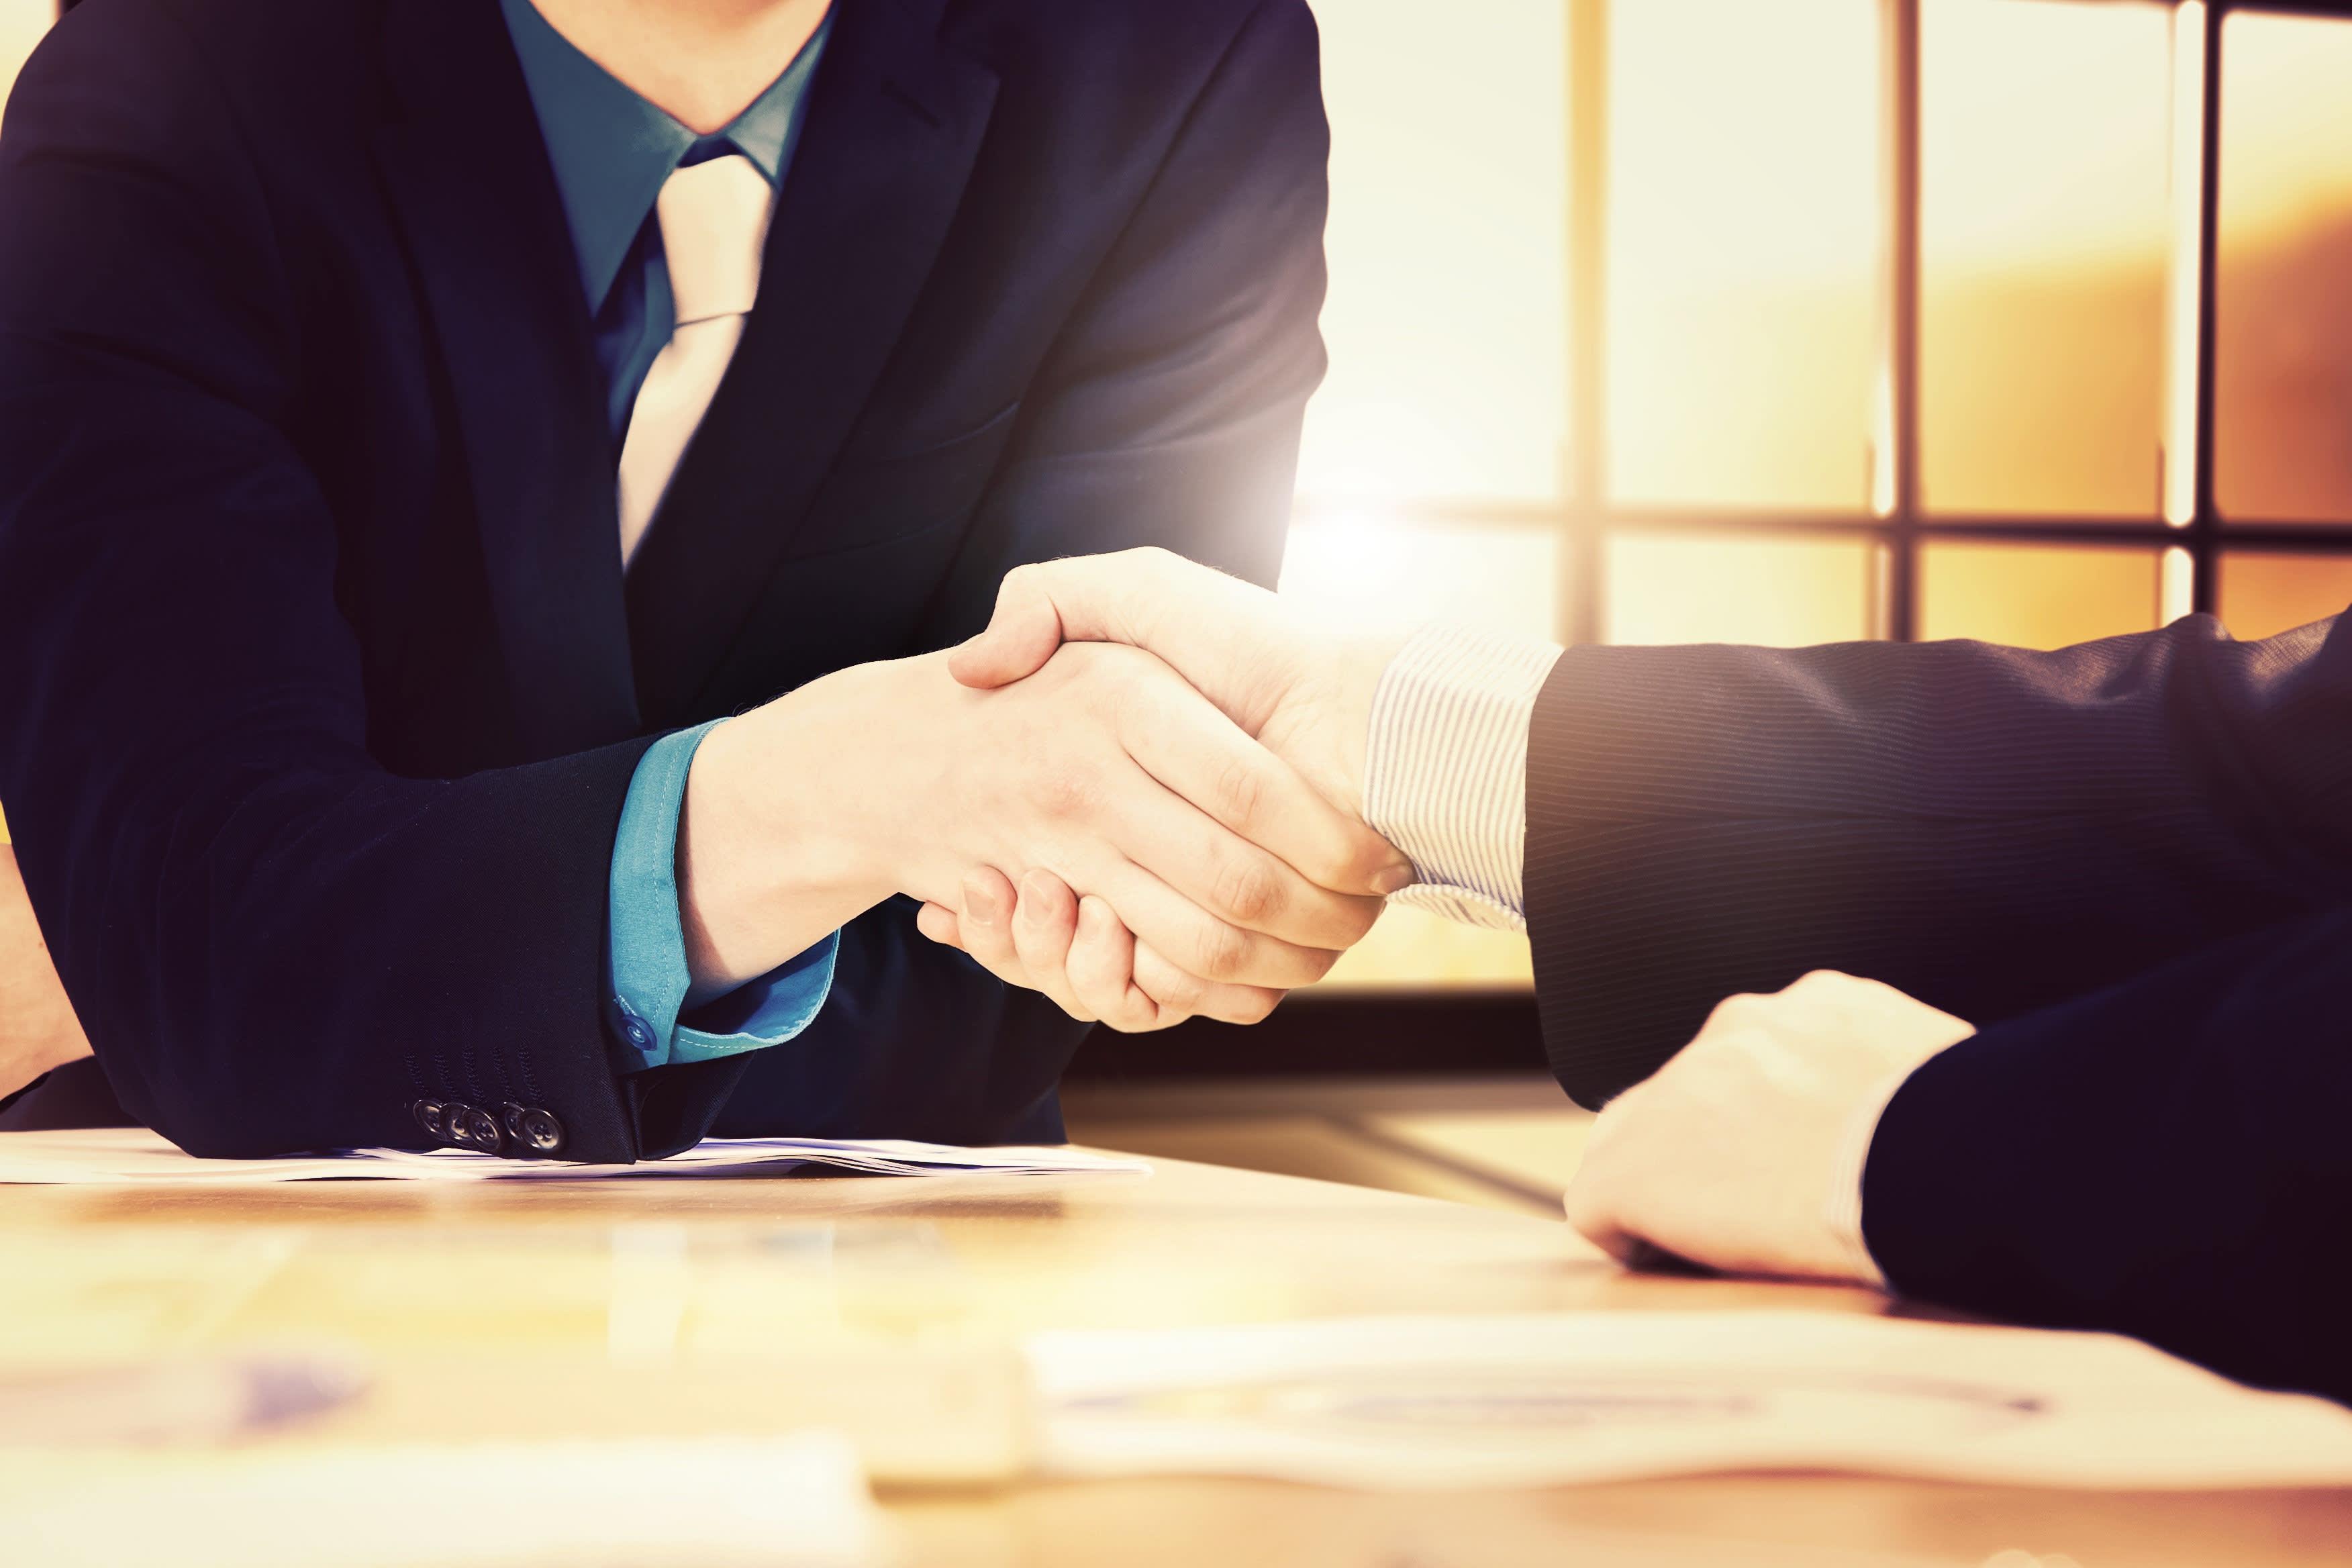 Tavistock reveals growth plans as advisers exit